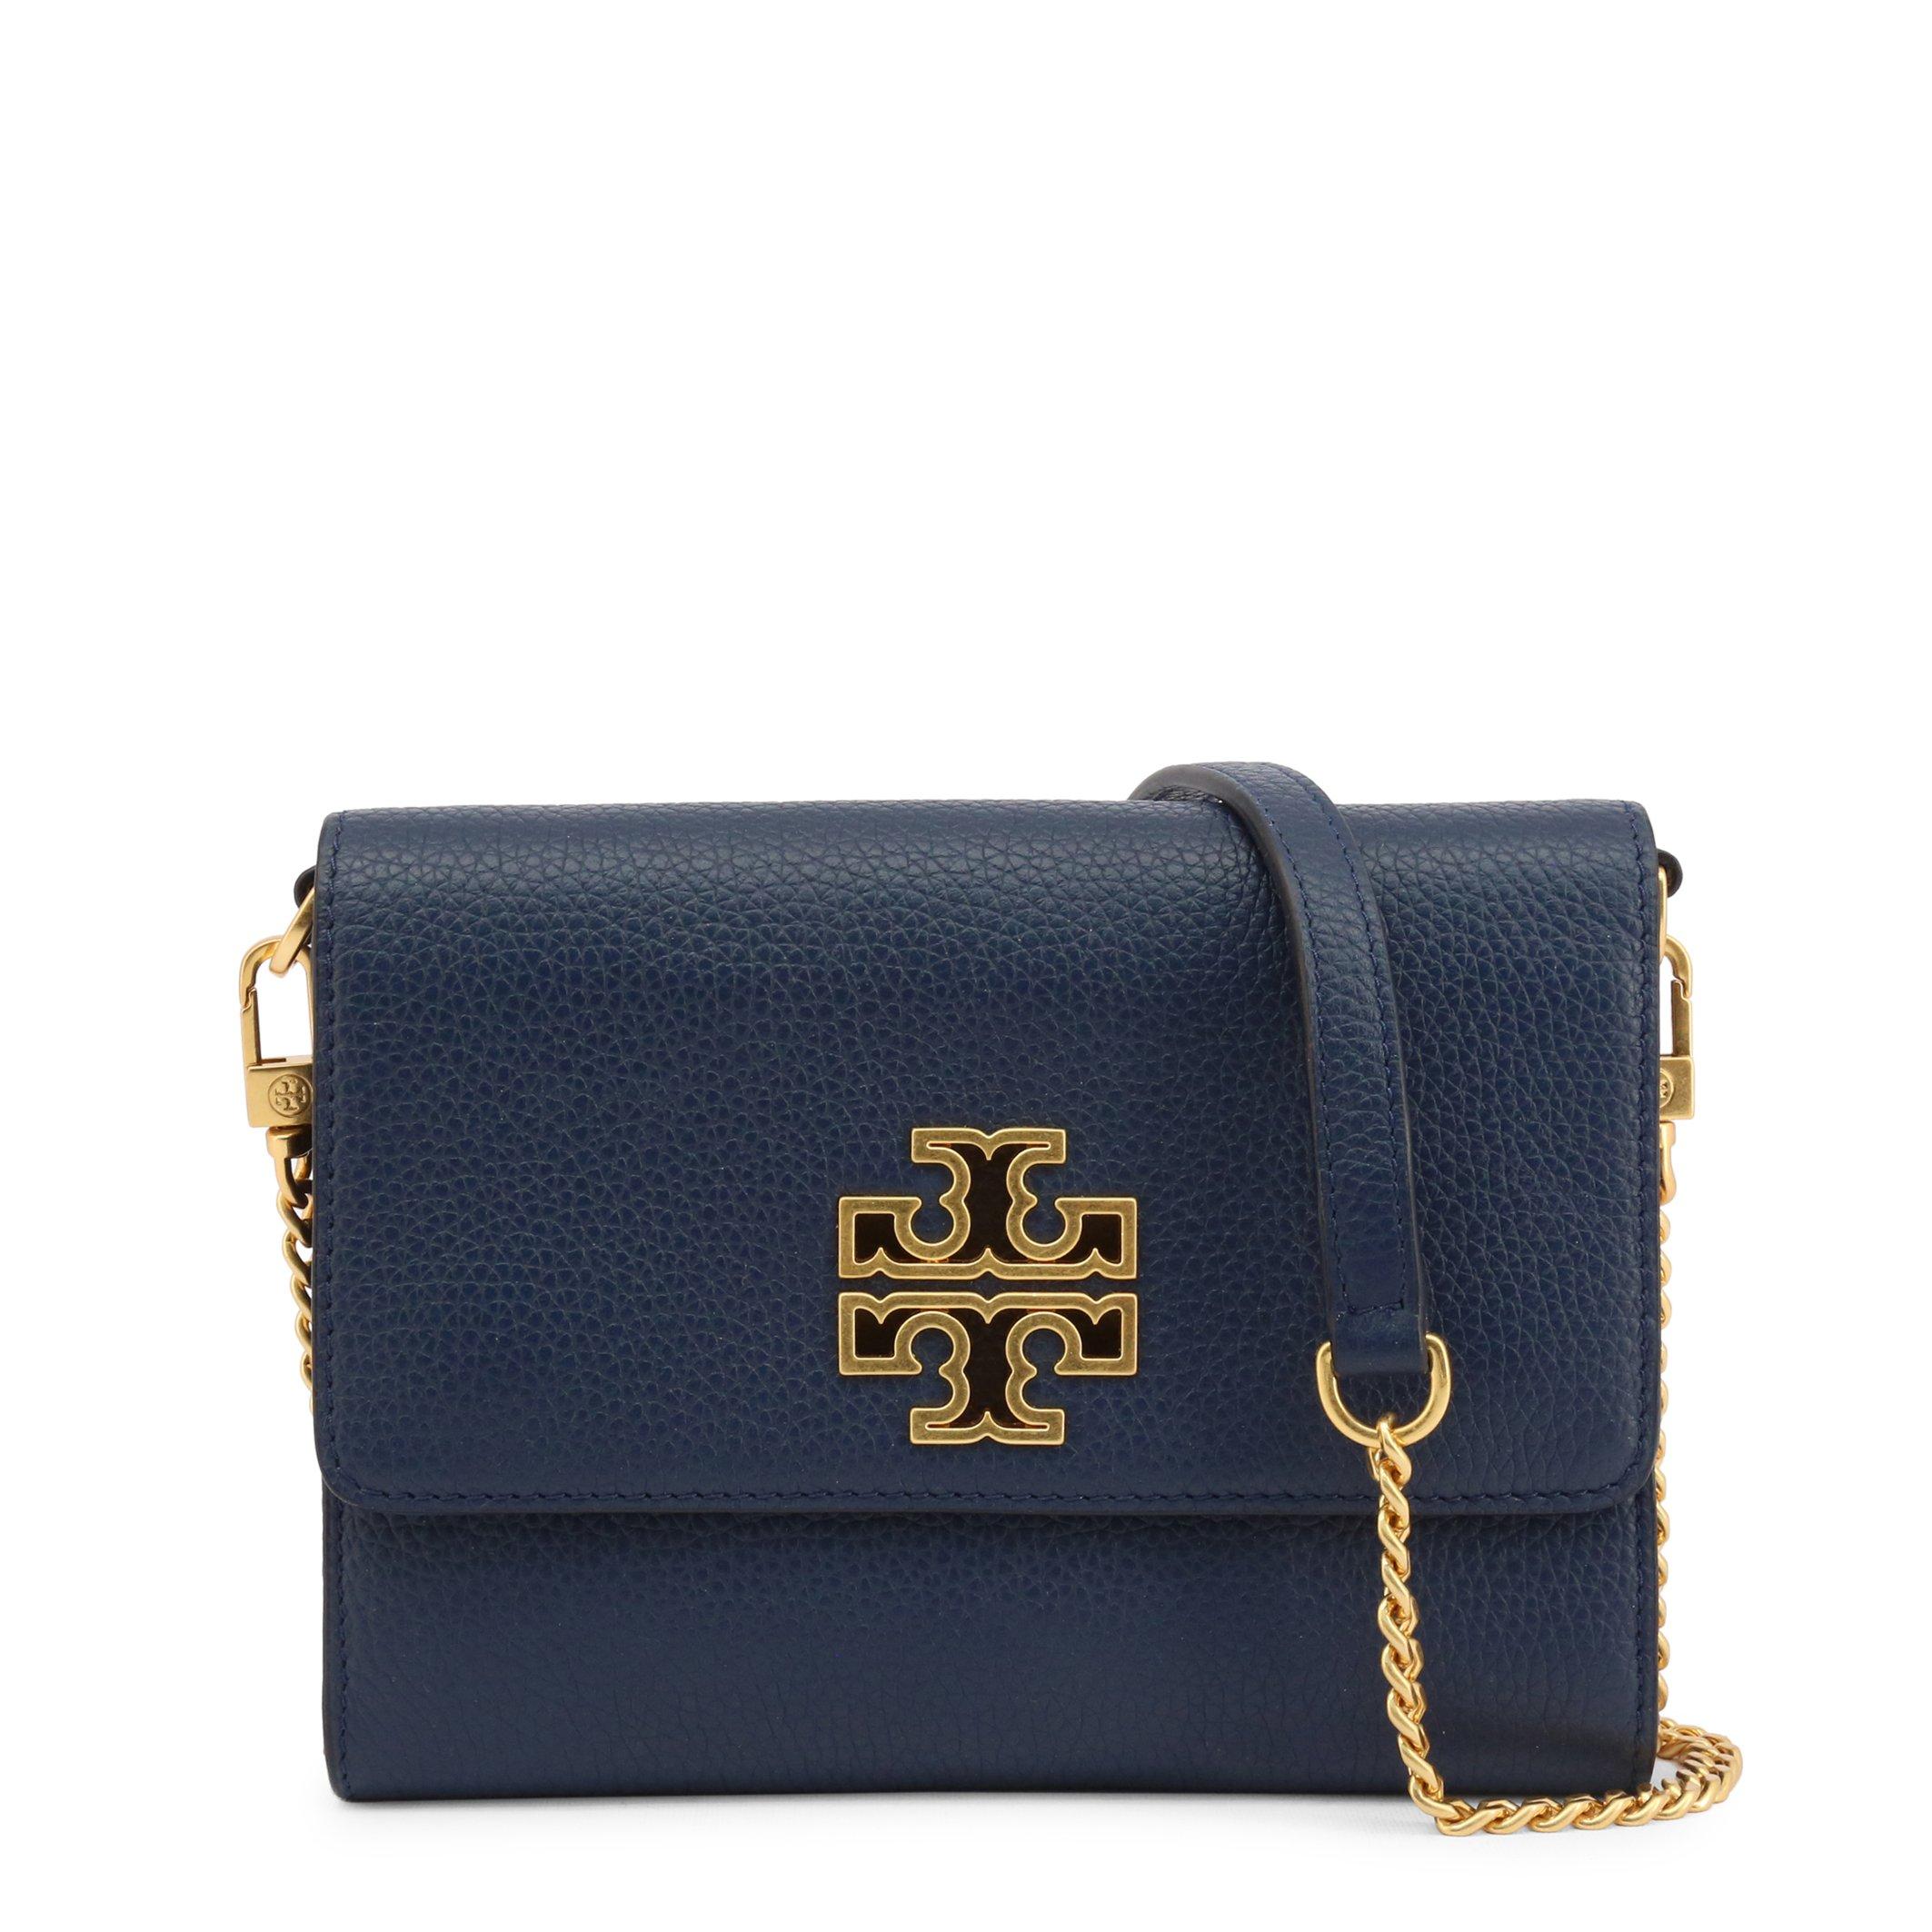 Tory Burch Women's Crossbody Bag Various Colours 67296 - blue NOSIZE